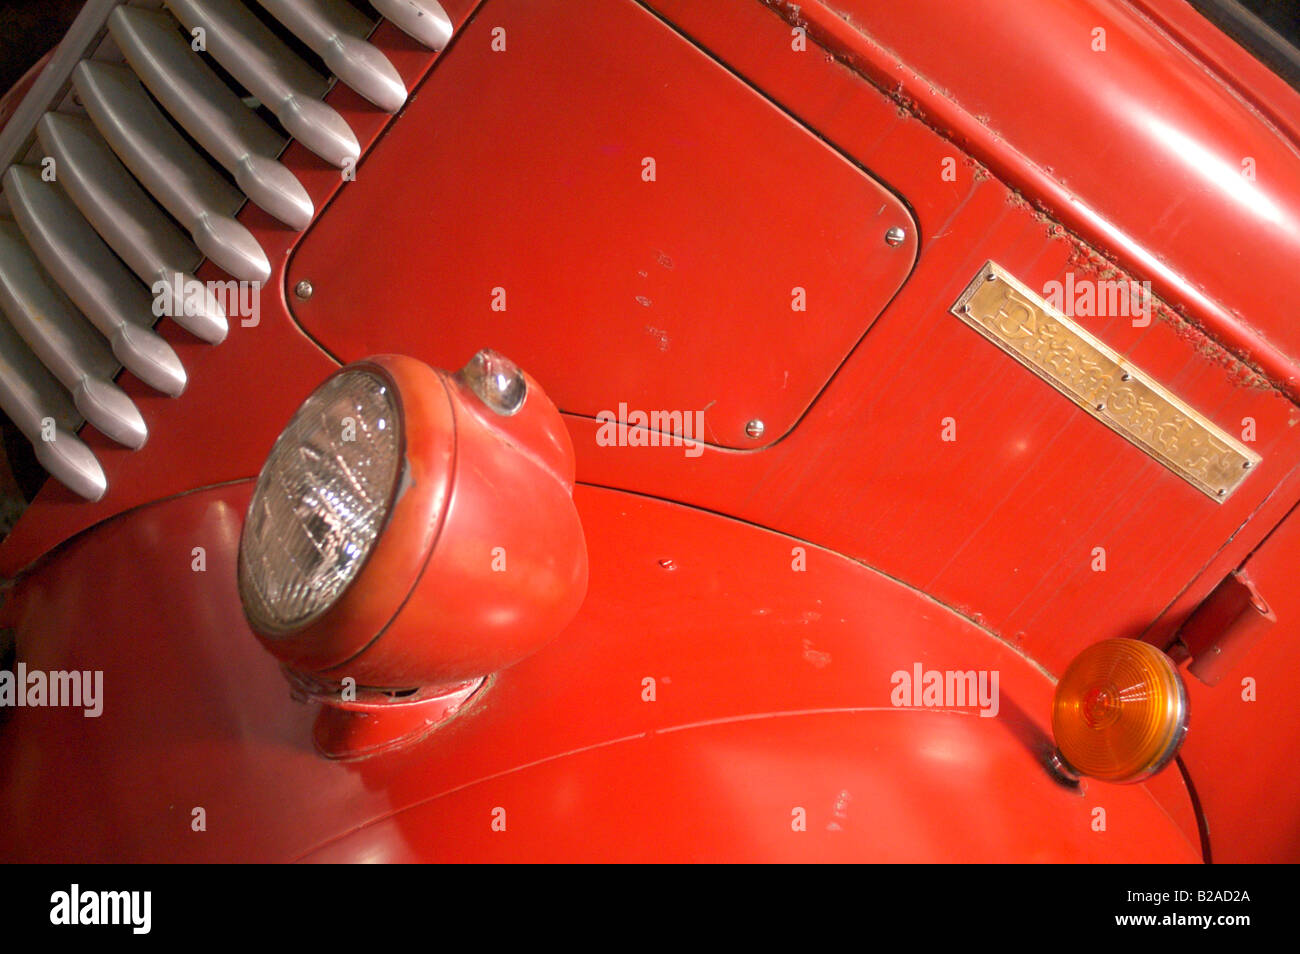 Reo Automobile Stock Photos & Reo Automobile Stock Images